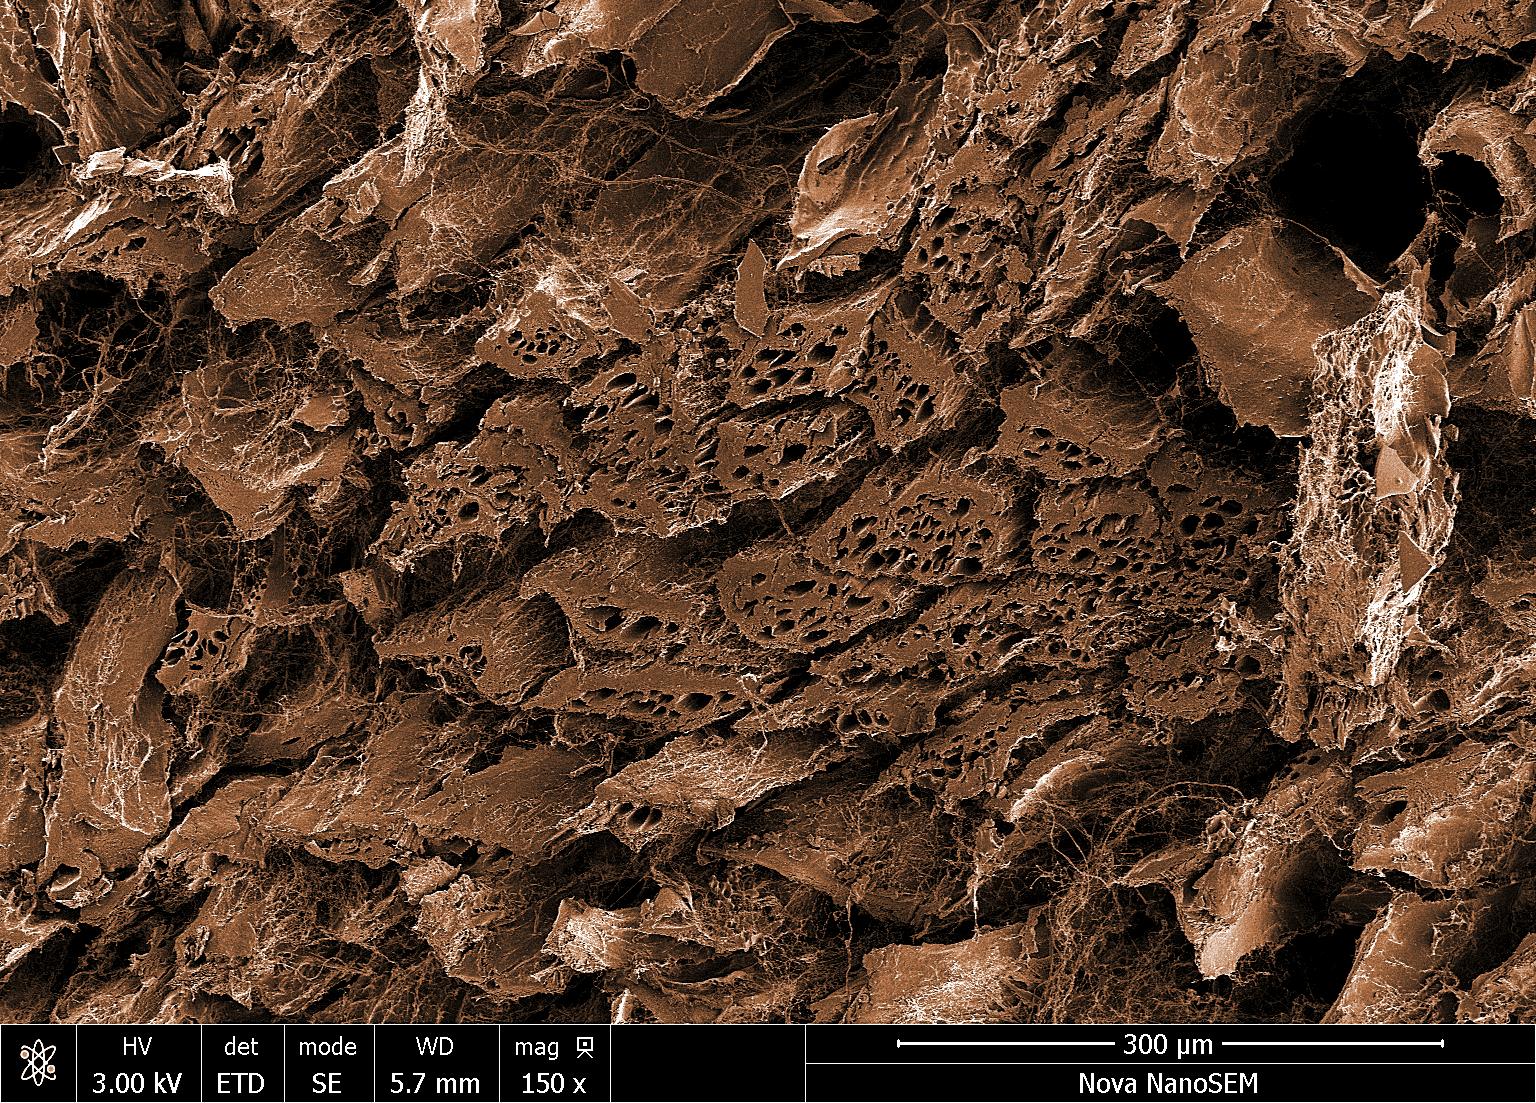 steak under microscope